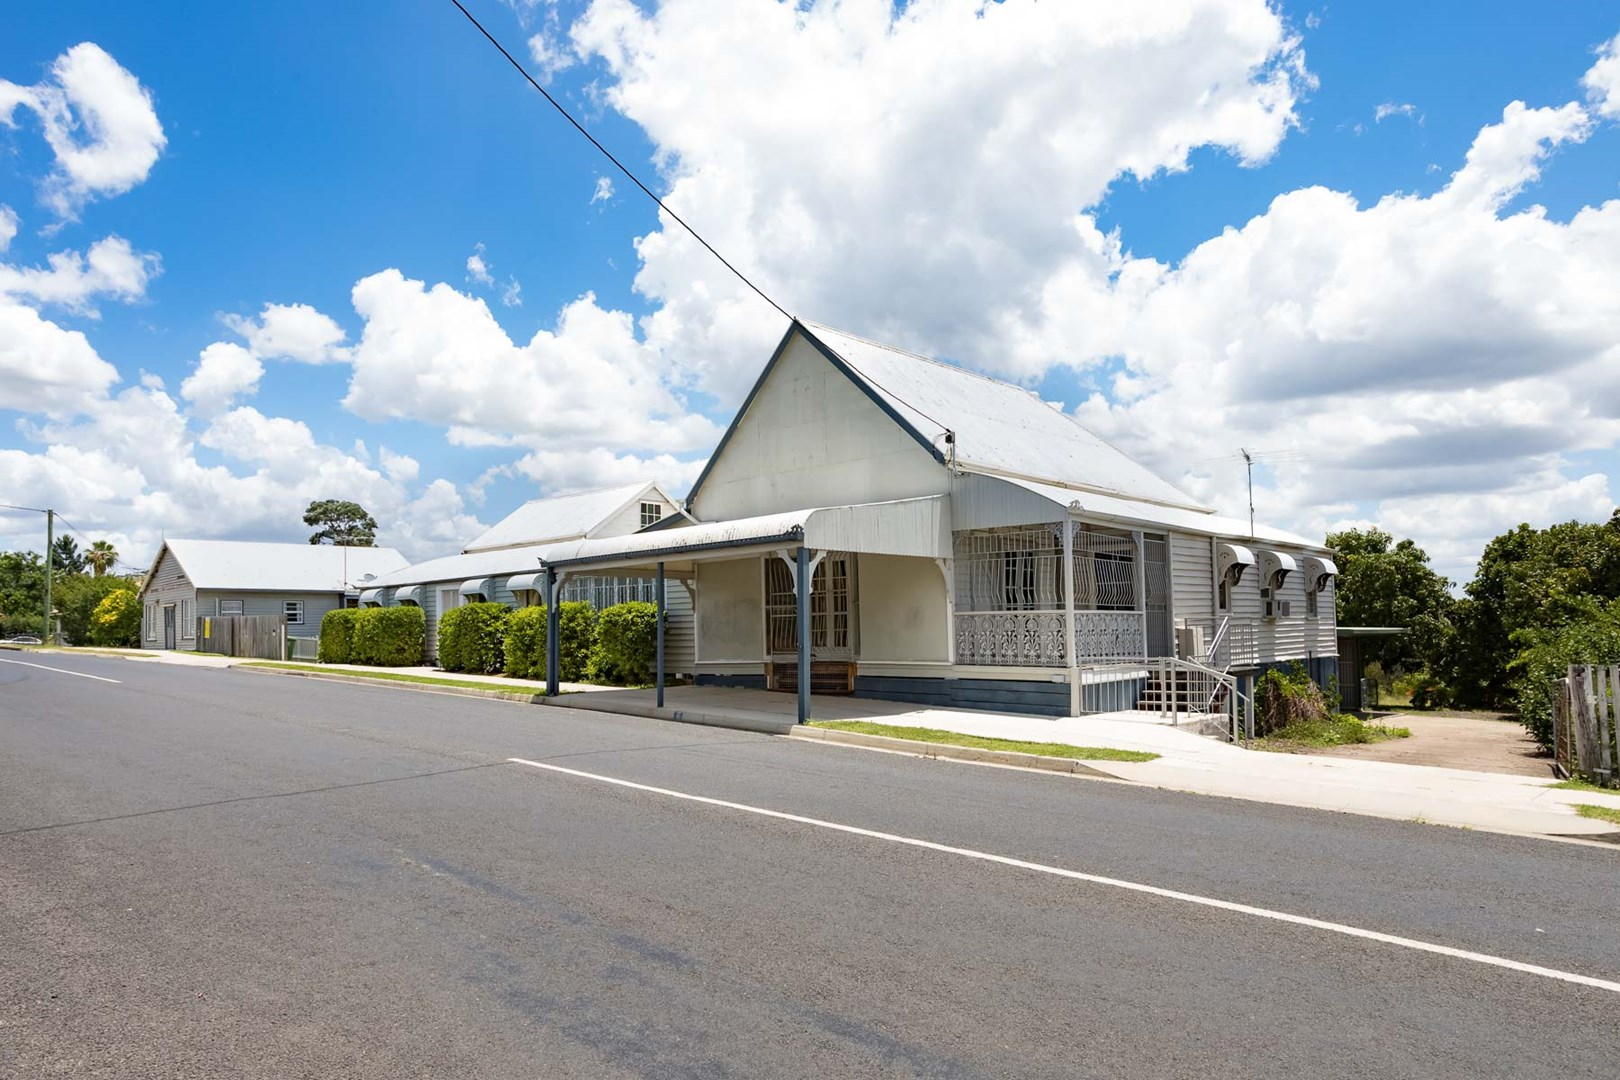 25-29 Park  Street, Lowood QLD 4311, Image 0